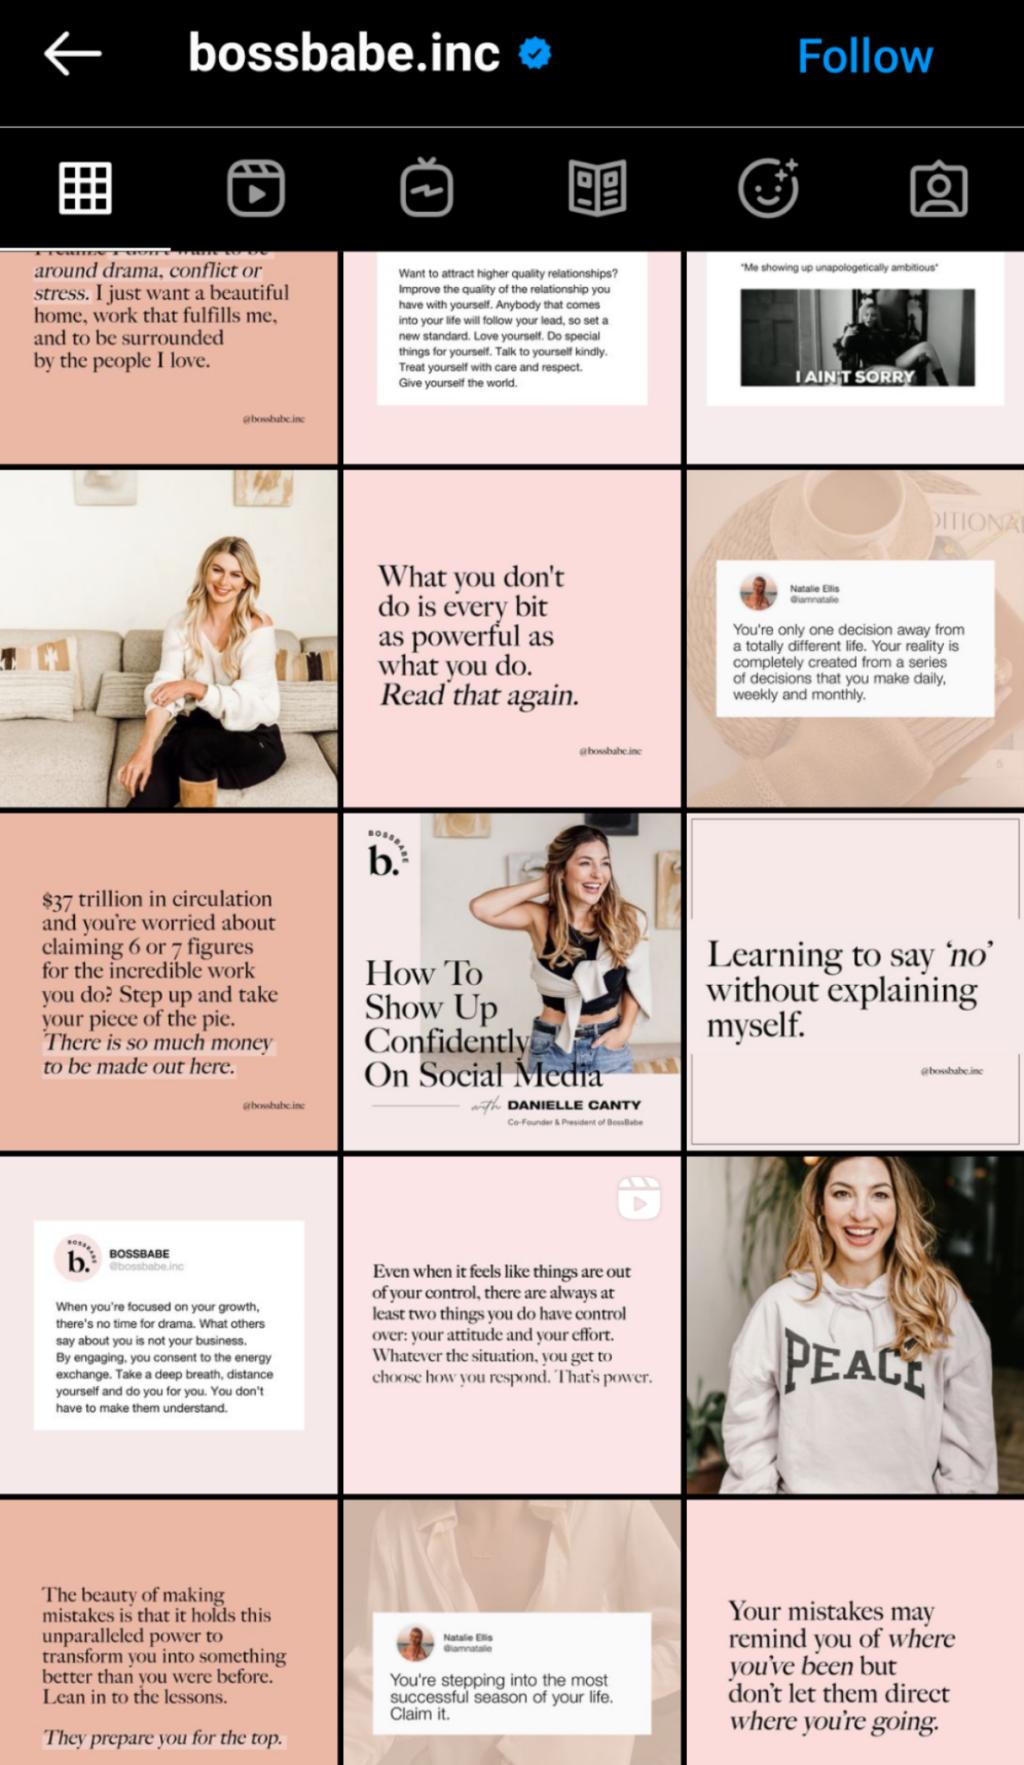 10 Creative Photo Grid Ideas for Instagram